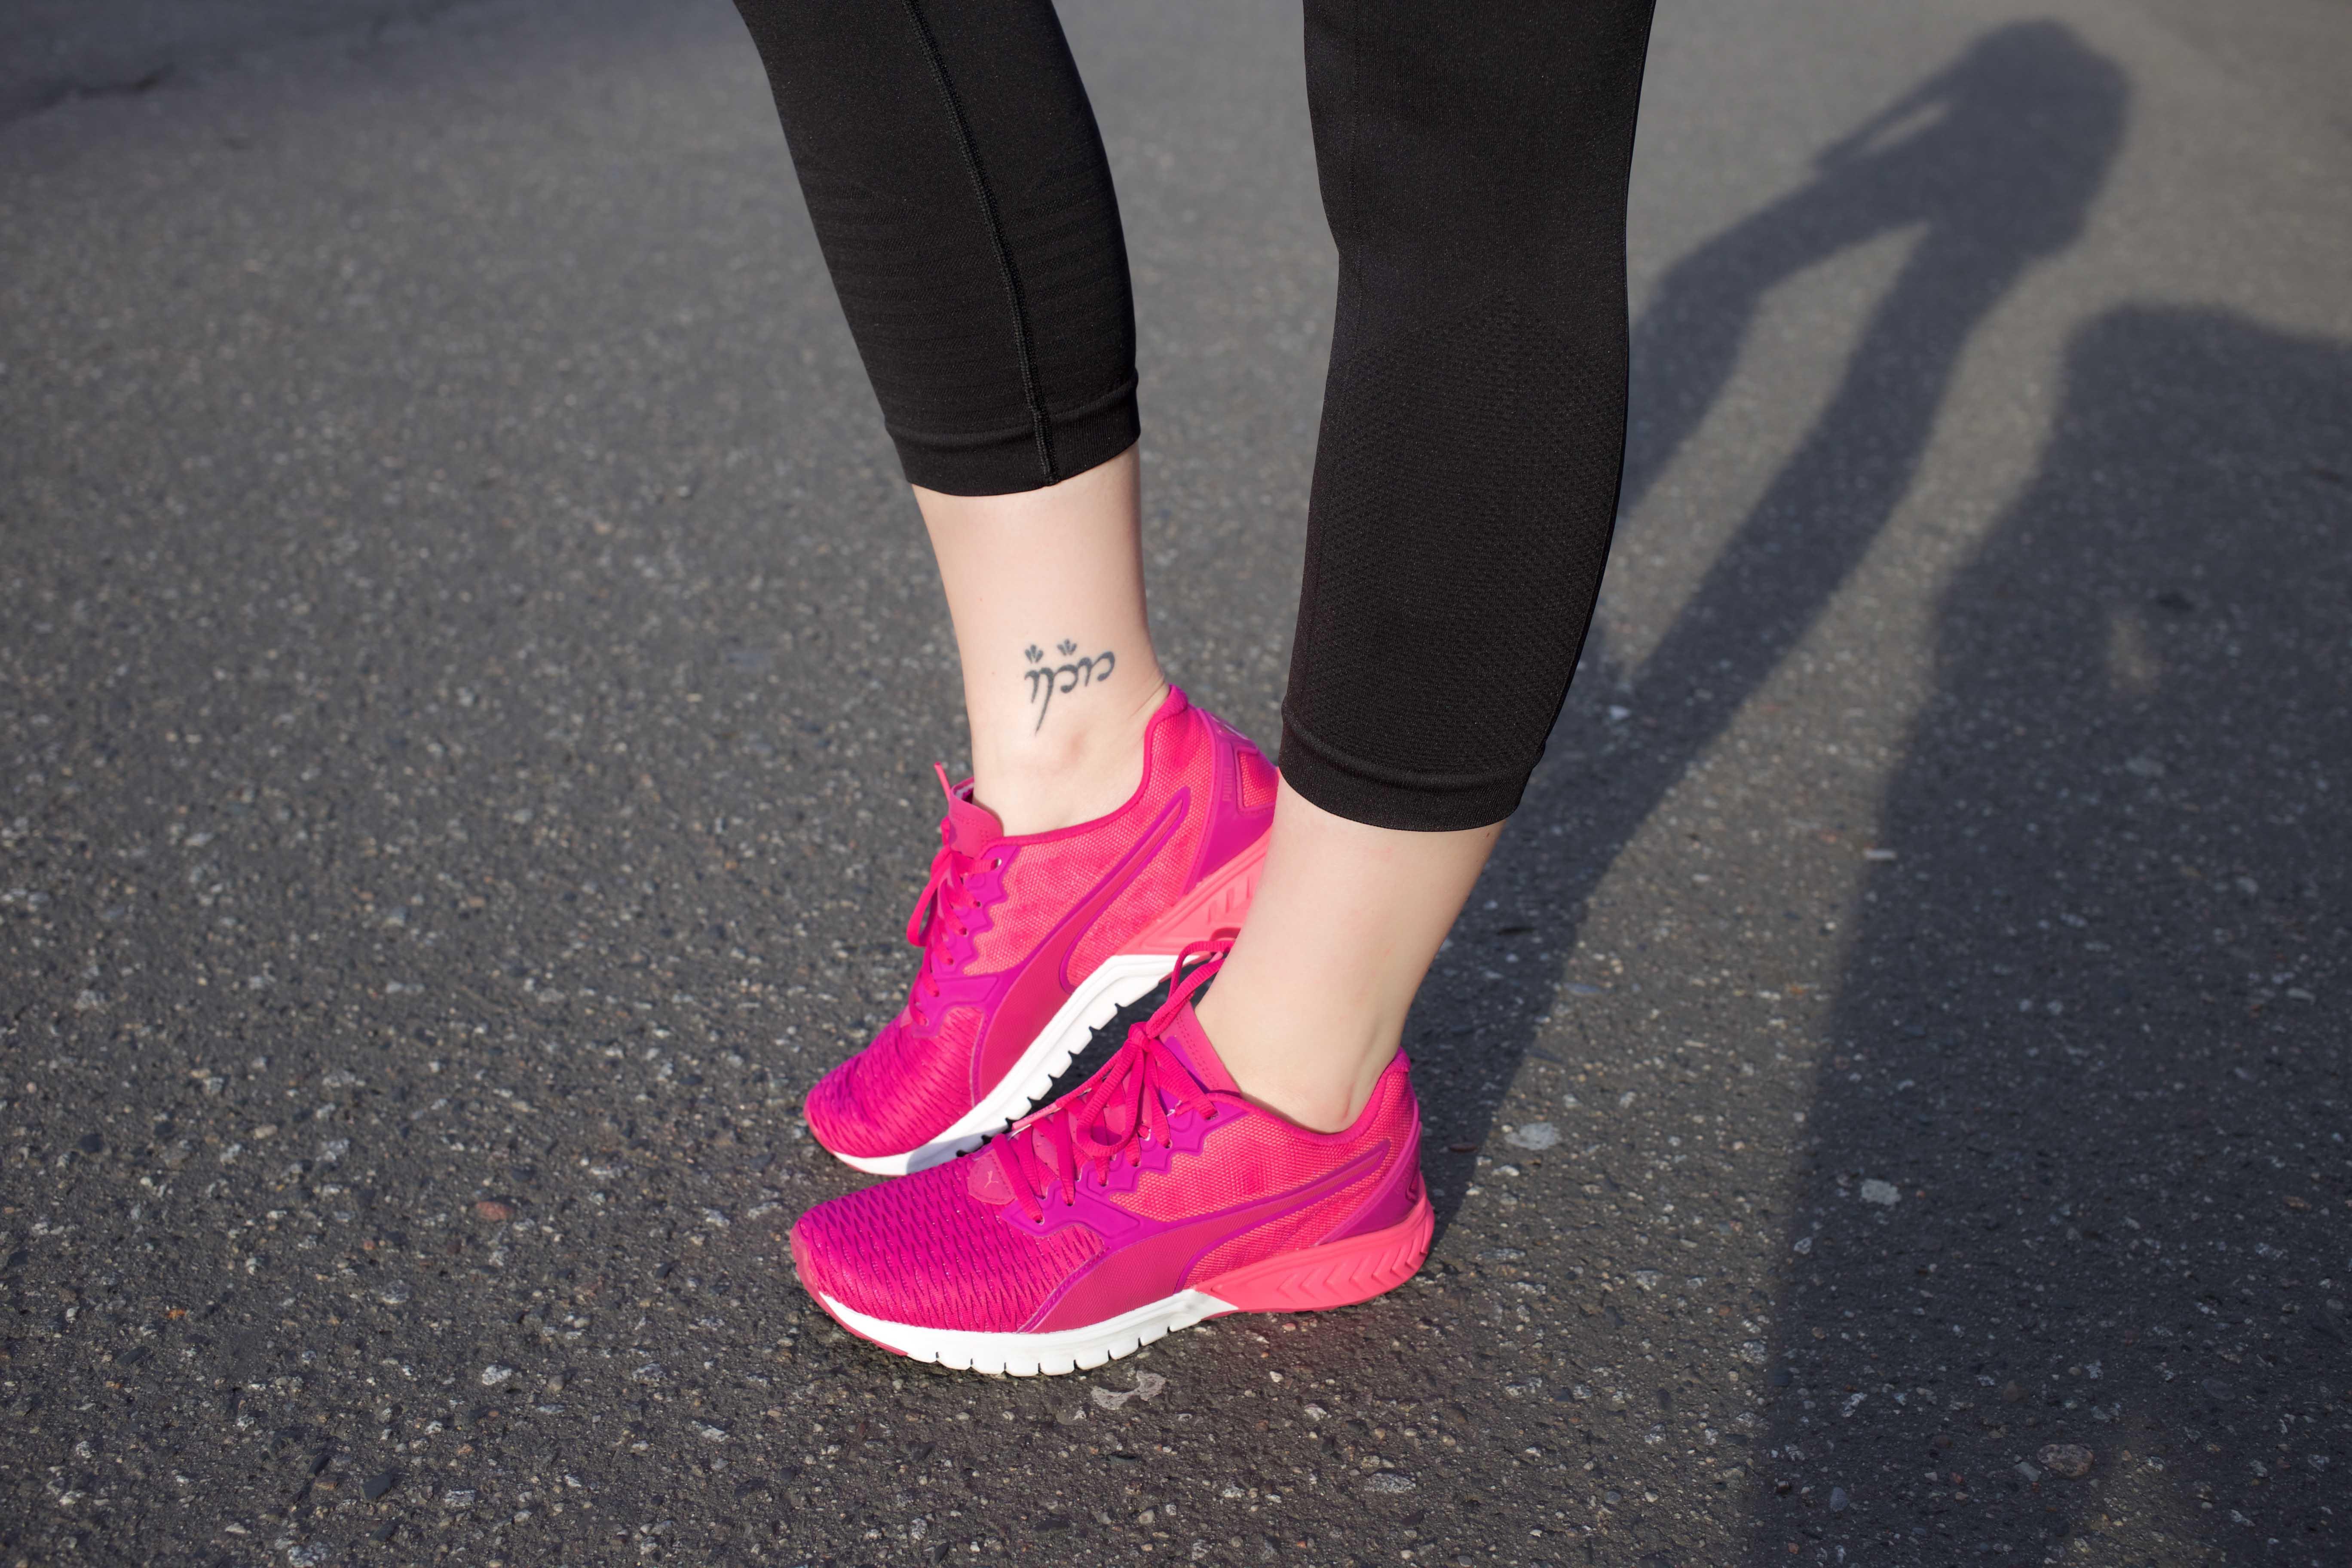 puma-lauf-outfit-laufen-tipps-joggen-mode-fitness-gym-workout-sport_8472